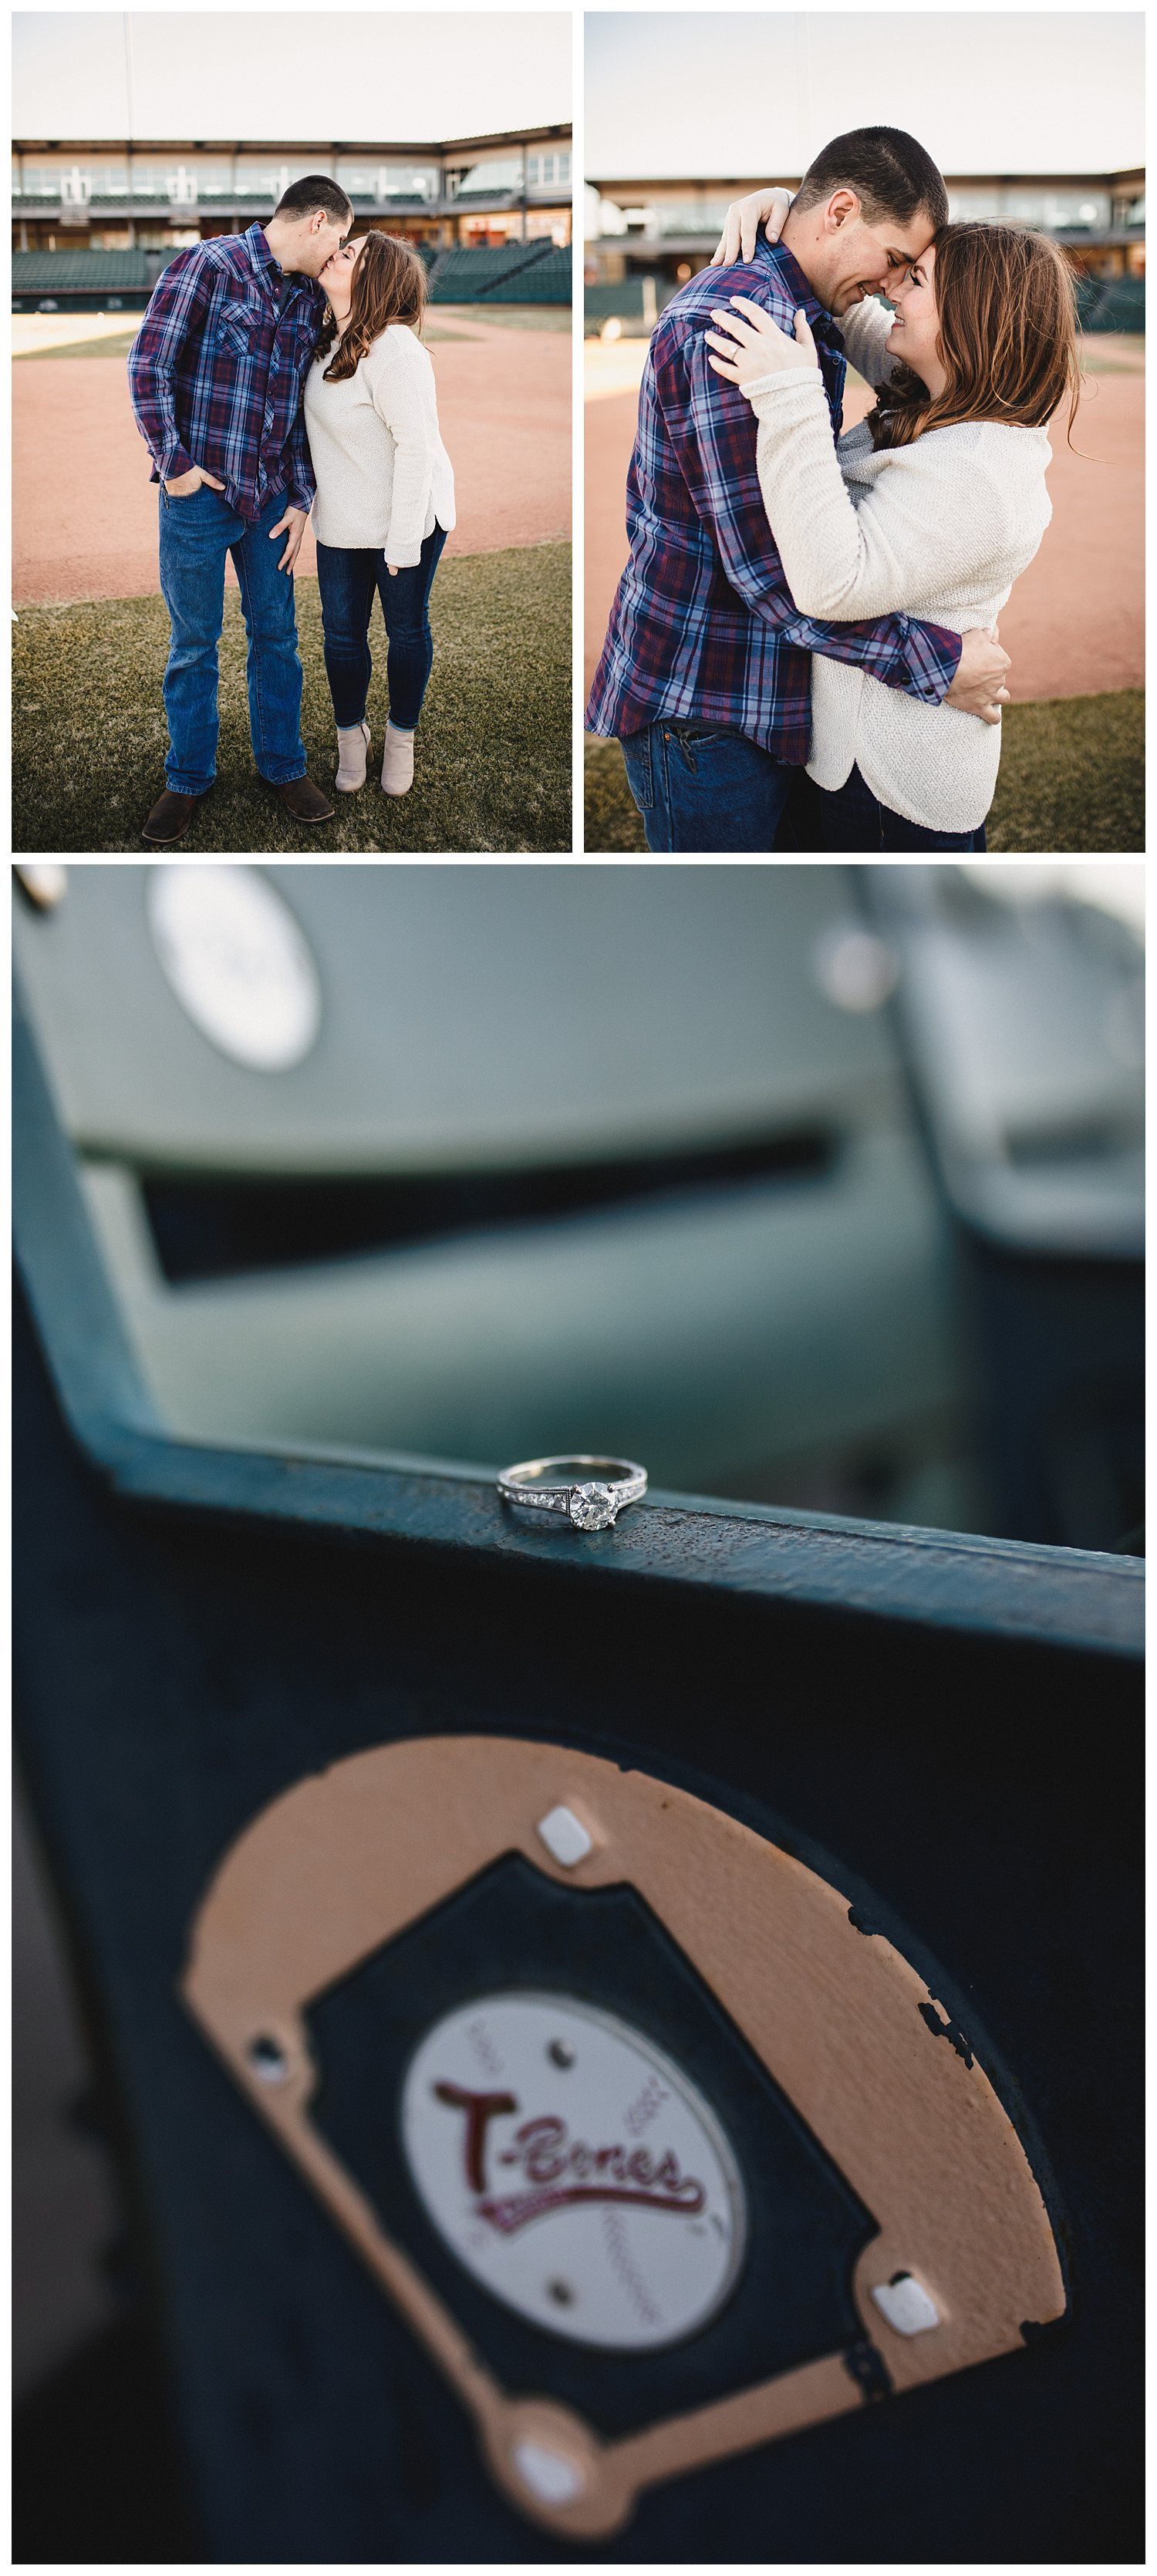 Kelsey_Diane_Photography_T-Bones_Stadium_Kansas_Wandering_Adventourus_Kansas_City_Engagement_0096.jpg